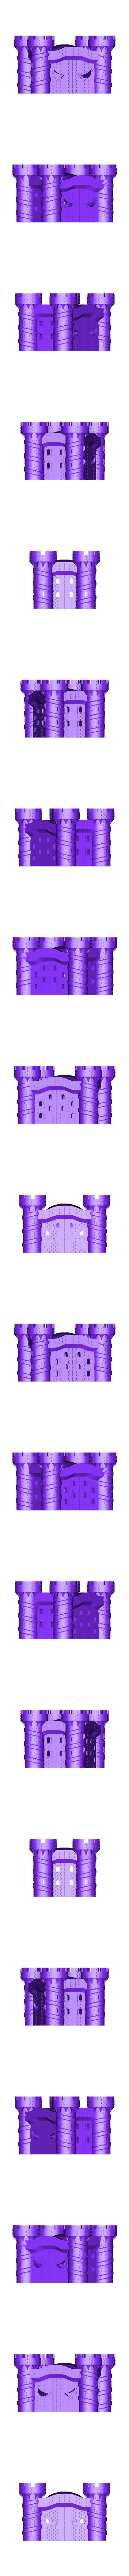 Castle_Top.stl Download free STL file Castle Dedede - Amiibo Prop • 3D printable object, ChrisBobo